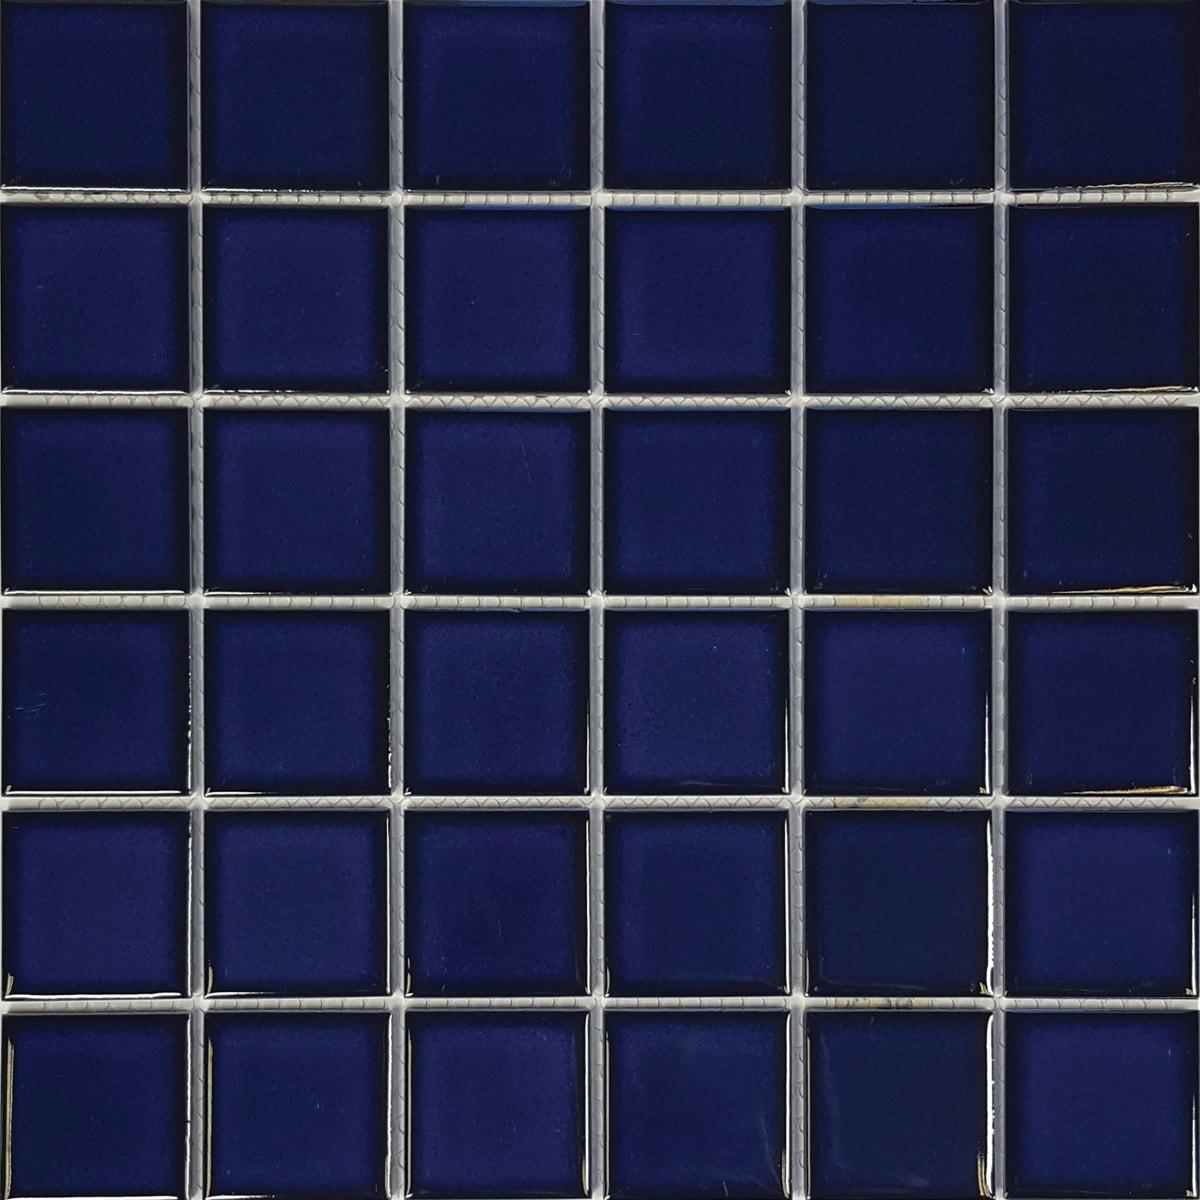 Cobalt Blue 2″ x 2″ (Harmony Series) Porcelain Pool Tile